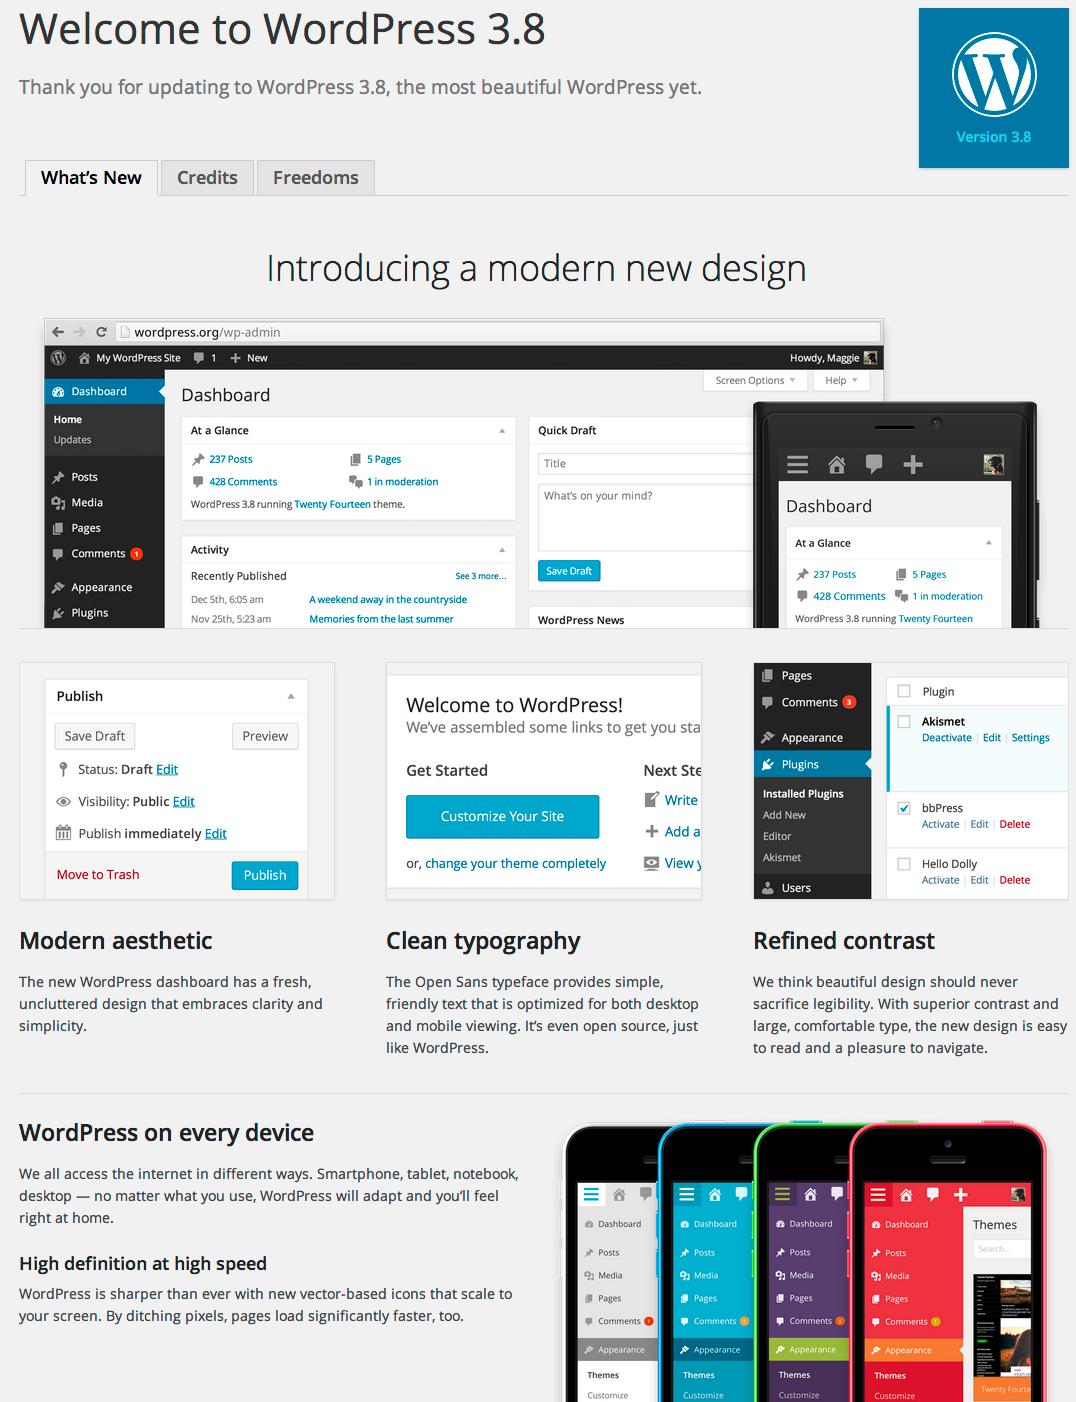 Screenshot of the WordPress 3.8 About Screen